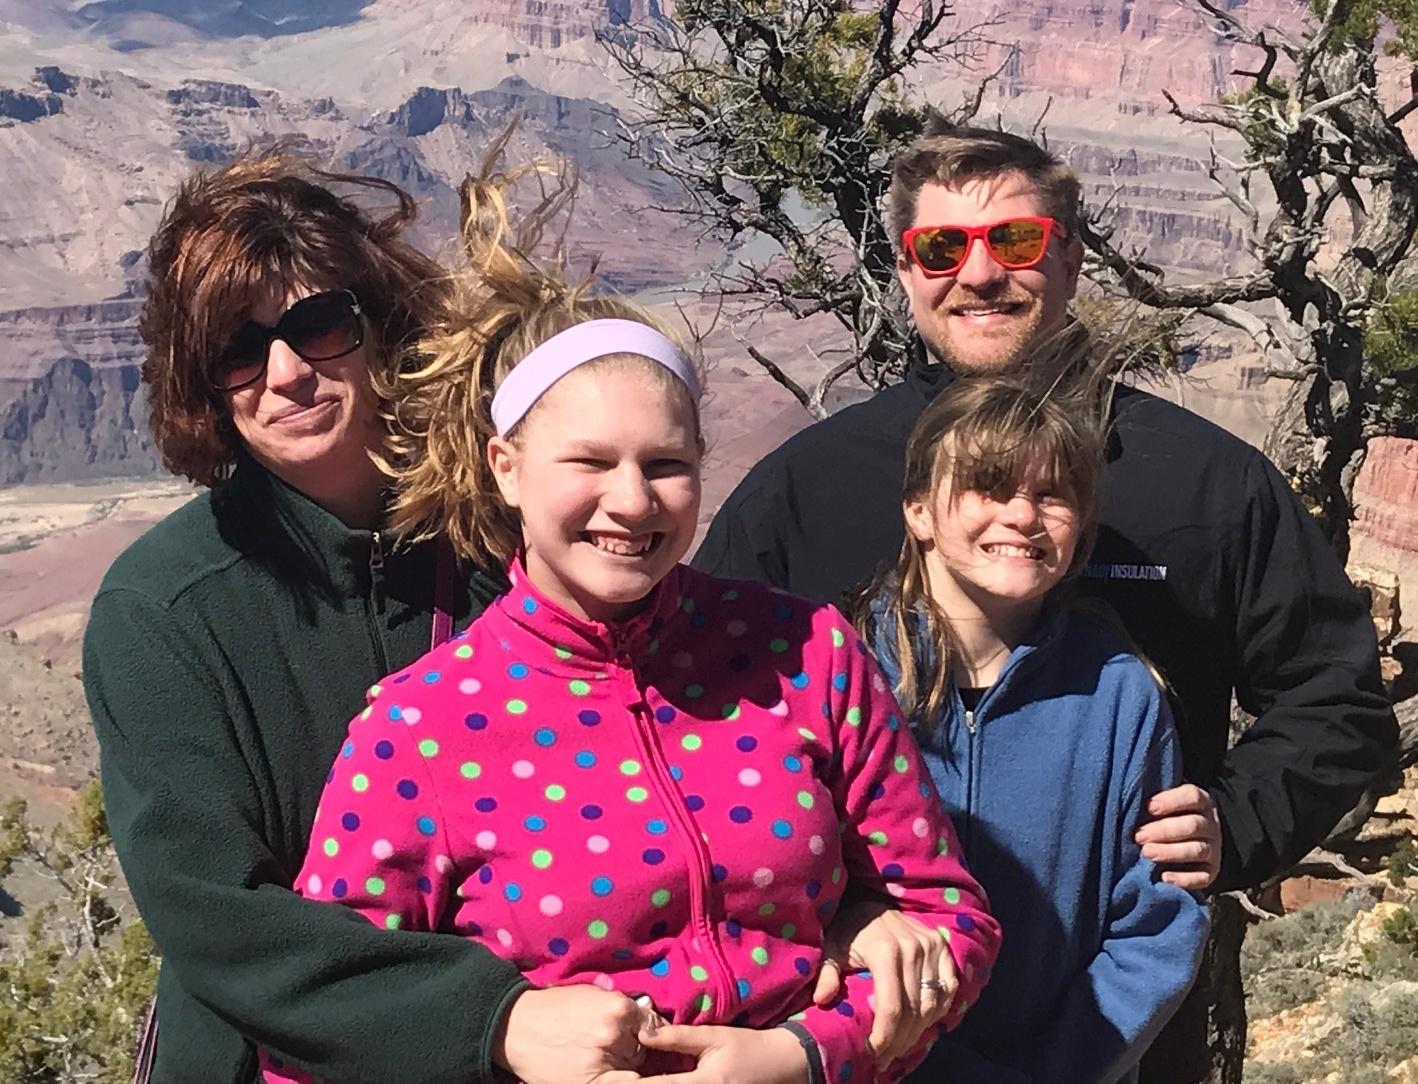 McIntyre Family at Grand Canyon-739796-edited.jpg